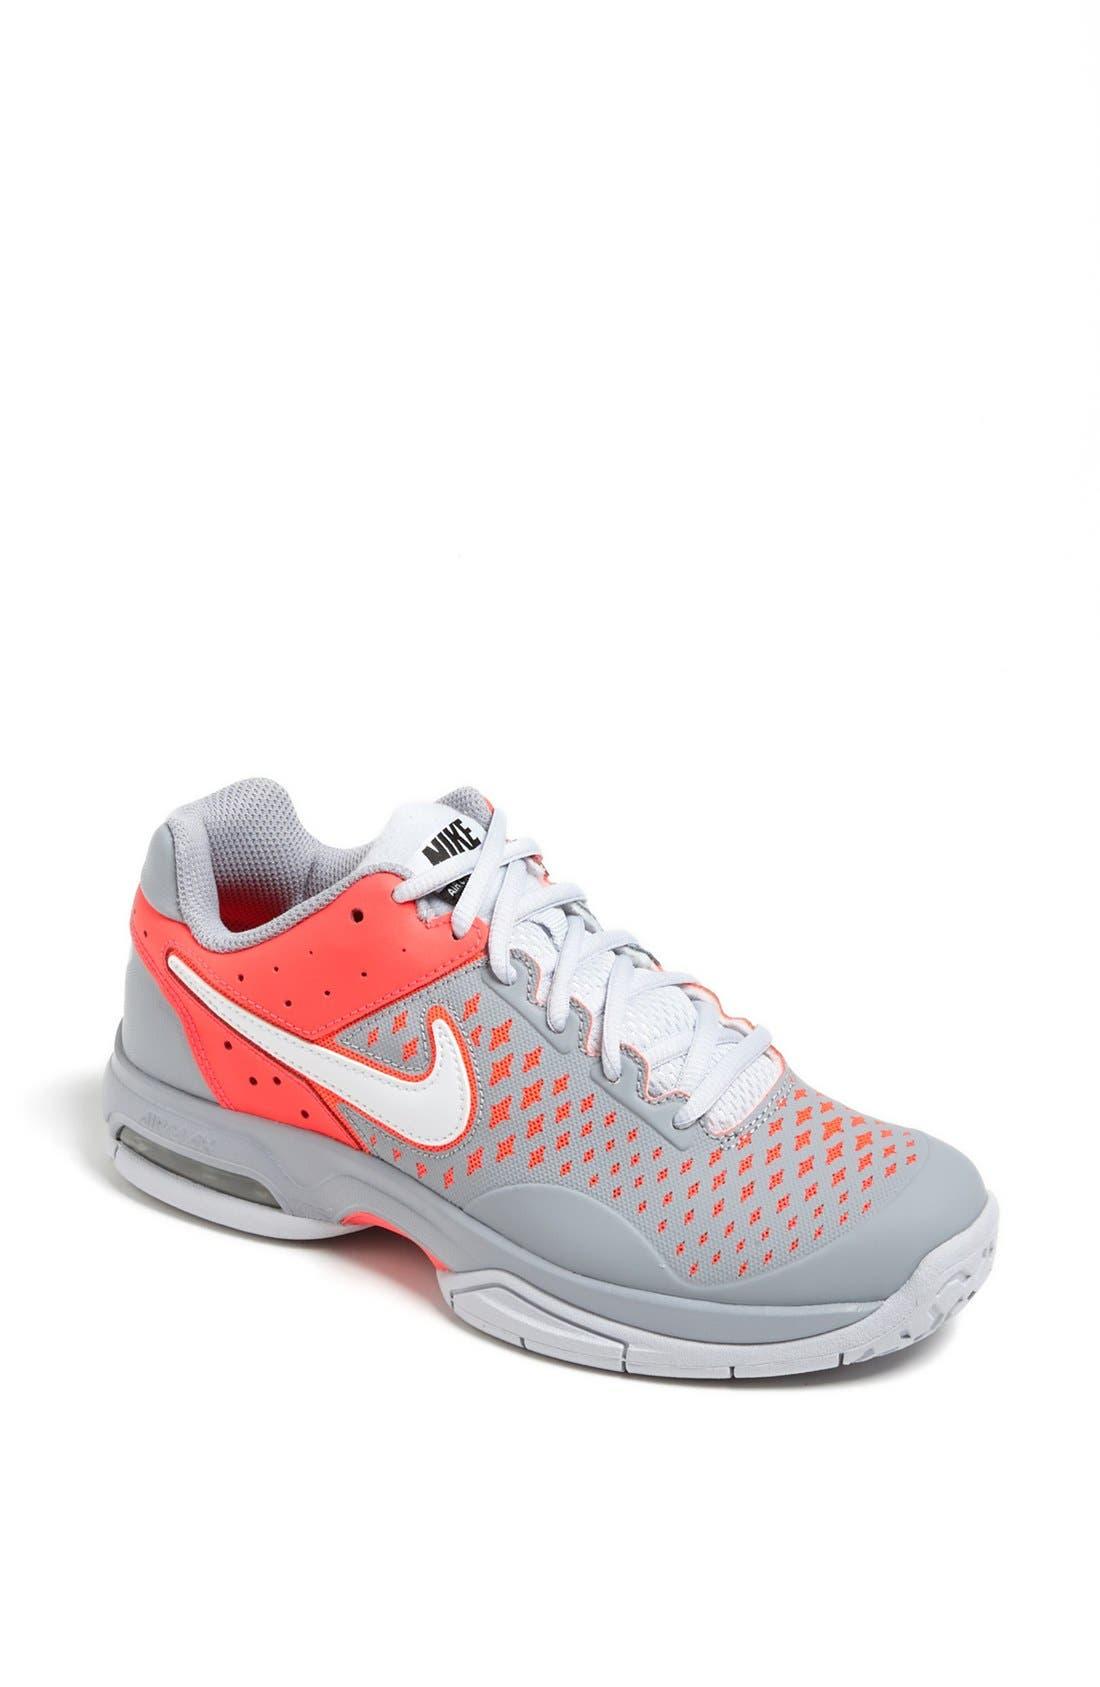 Alternate Image 1 Selected - Nike 'Air Cage Advantage' Tennis Shoe (Women)